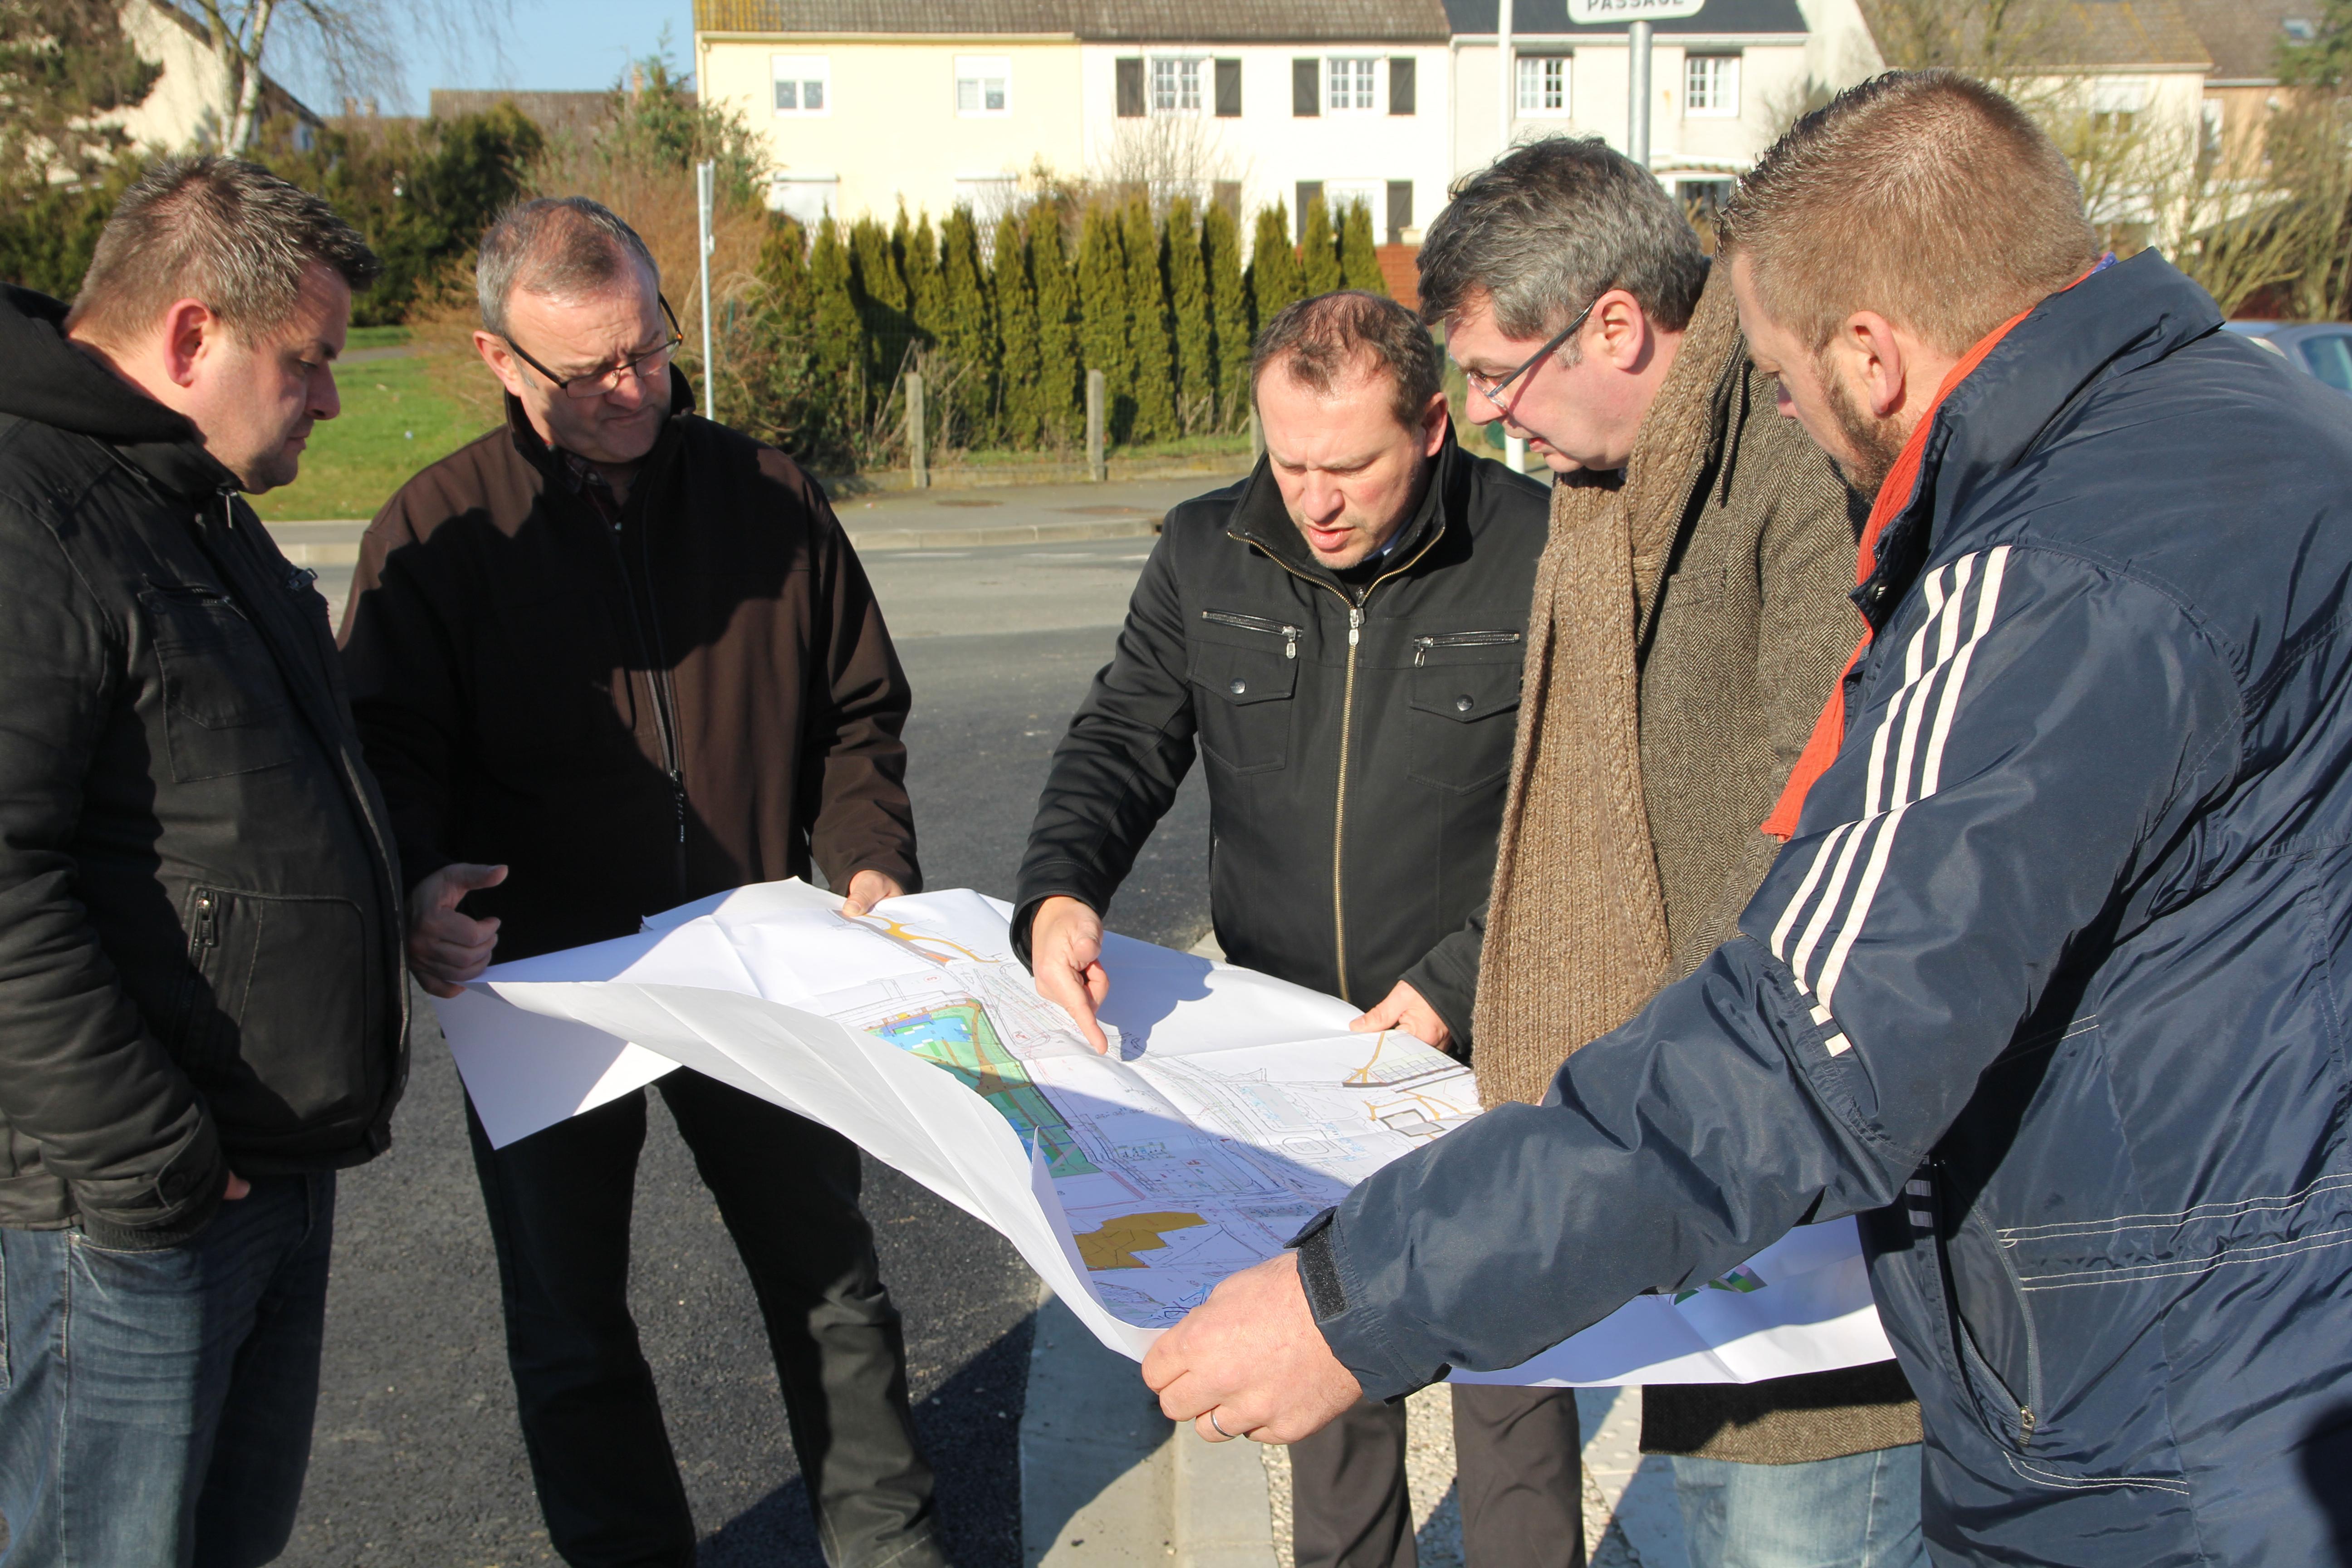 visite-chantier-thibaut-ok-4472